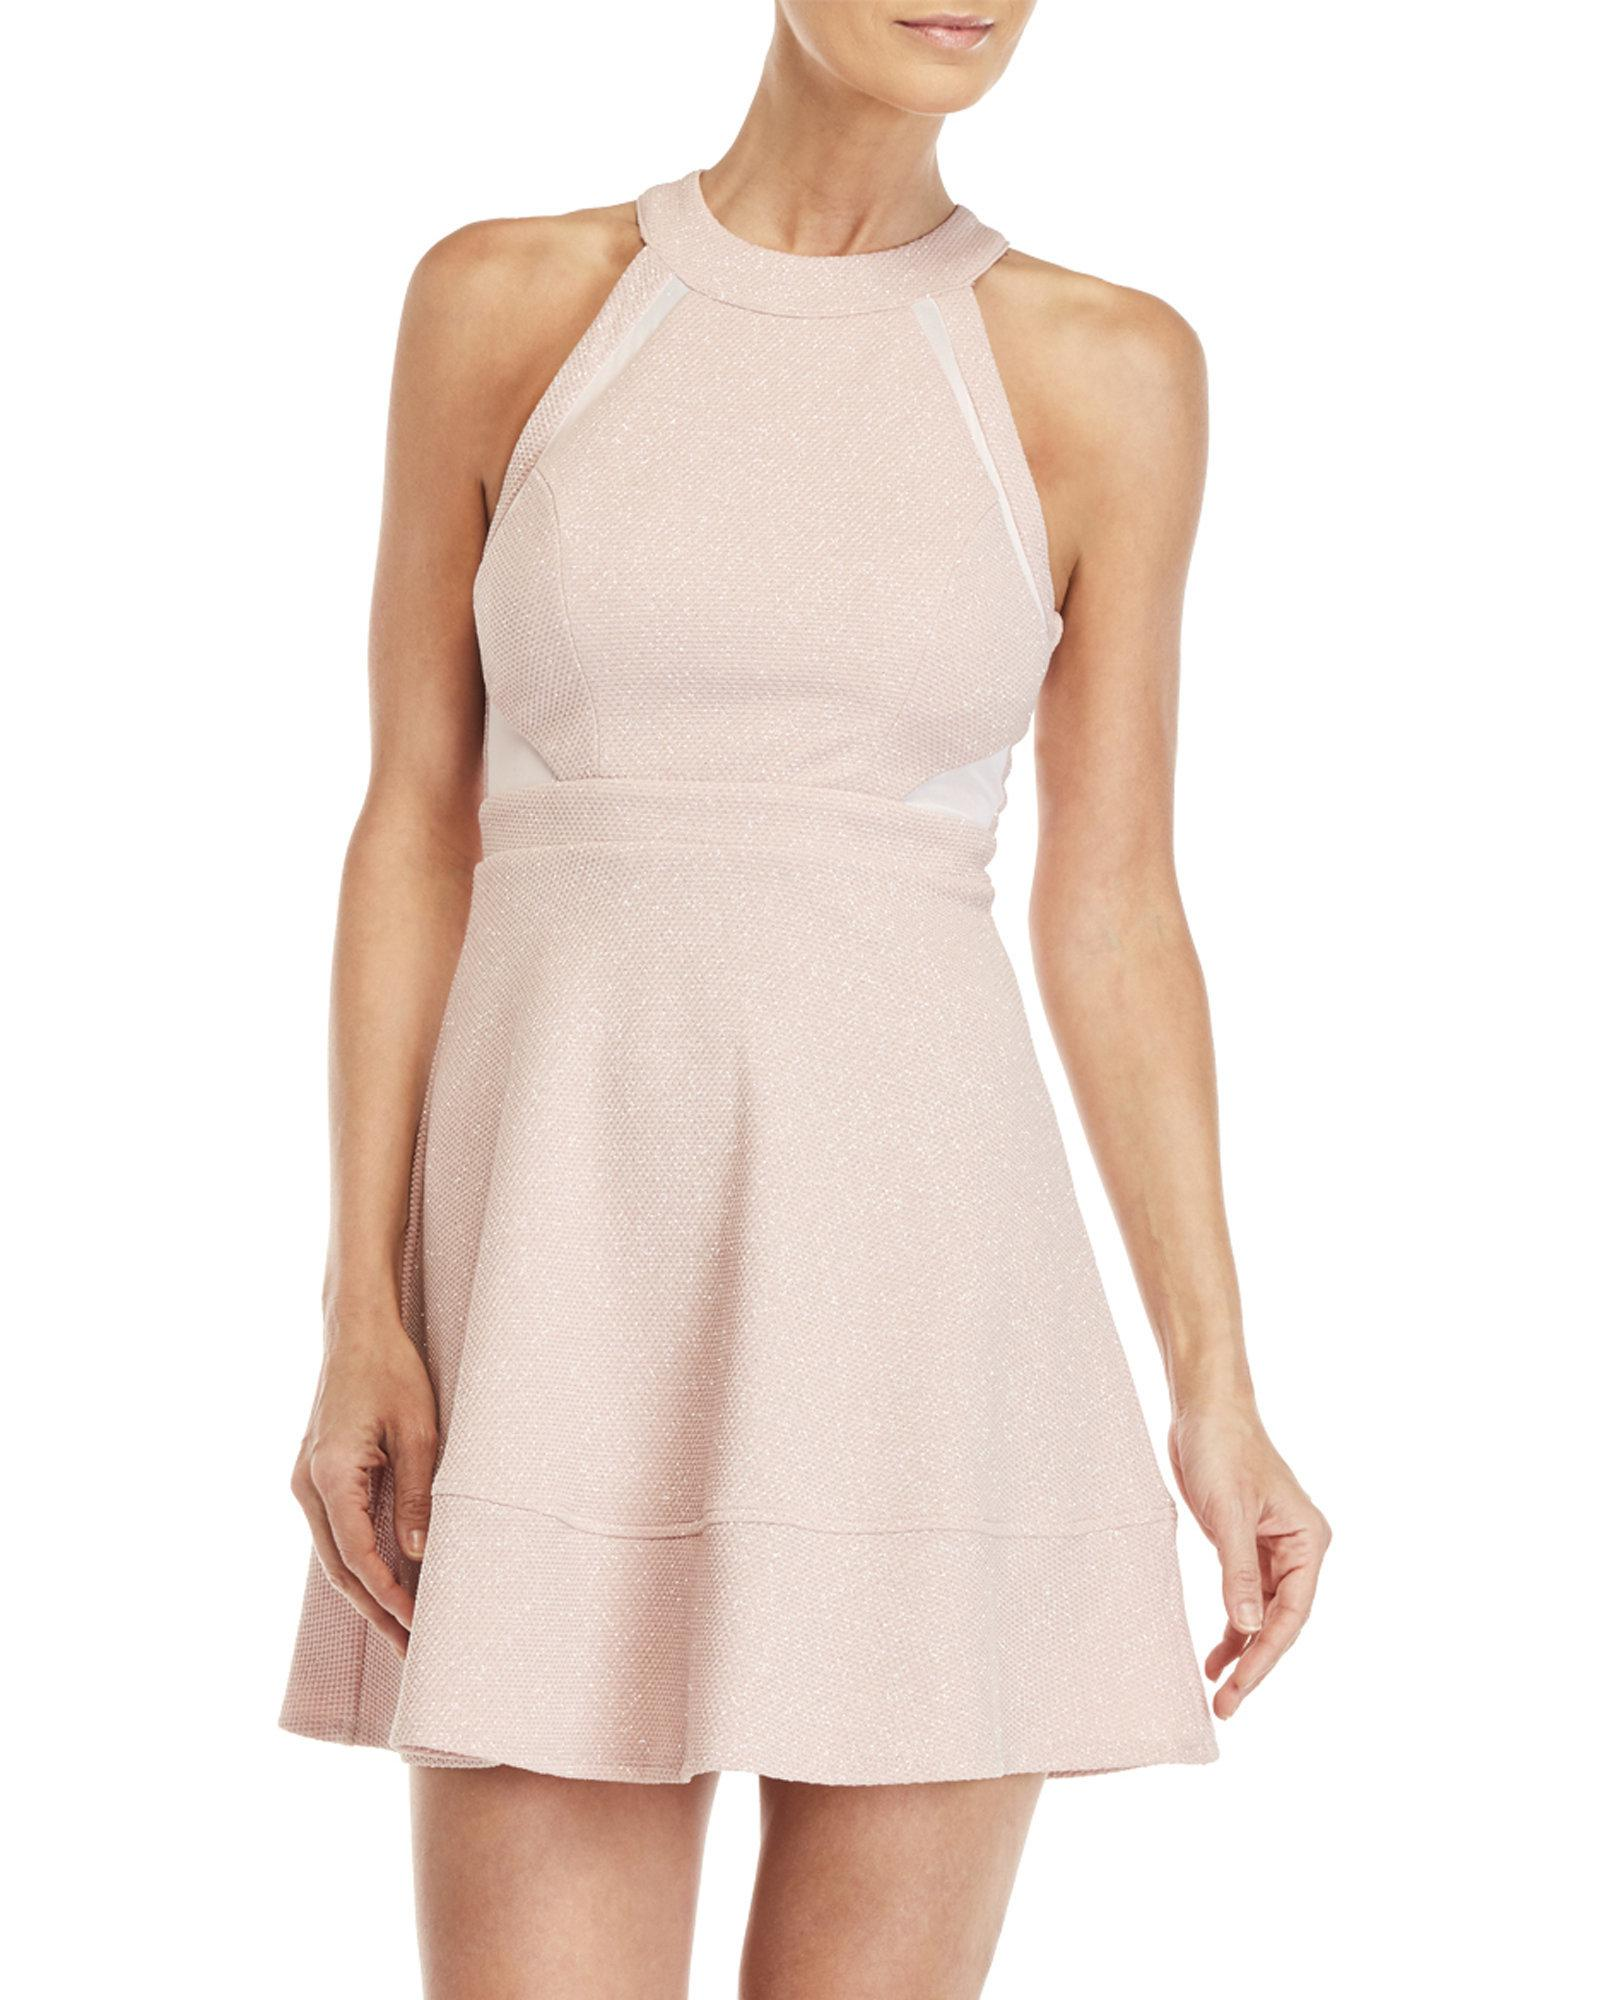 1775f50aa Emerald Sundae Blush Sleeveless Glitter Fit & Flare Dress in Pink - Lyst